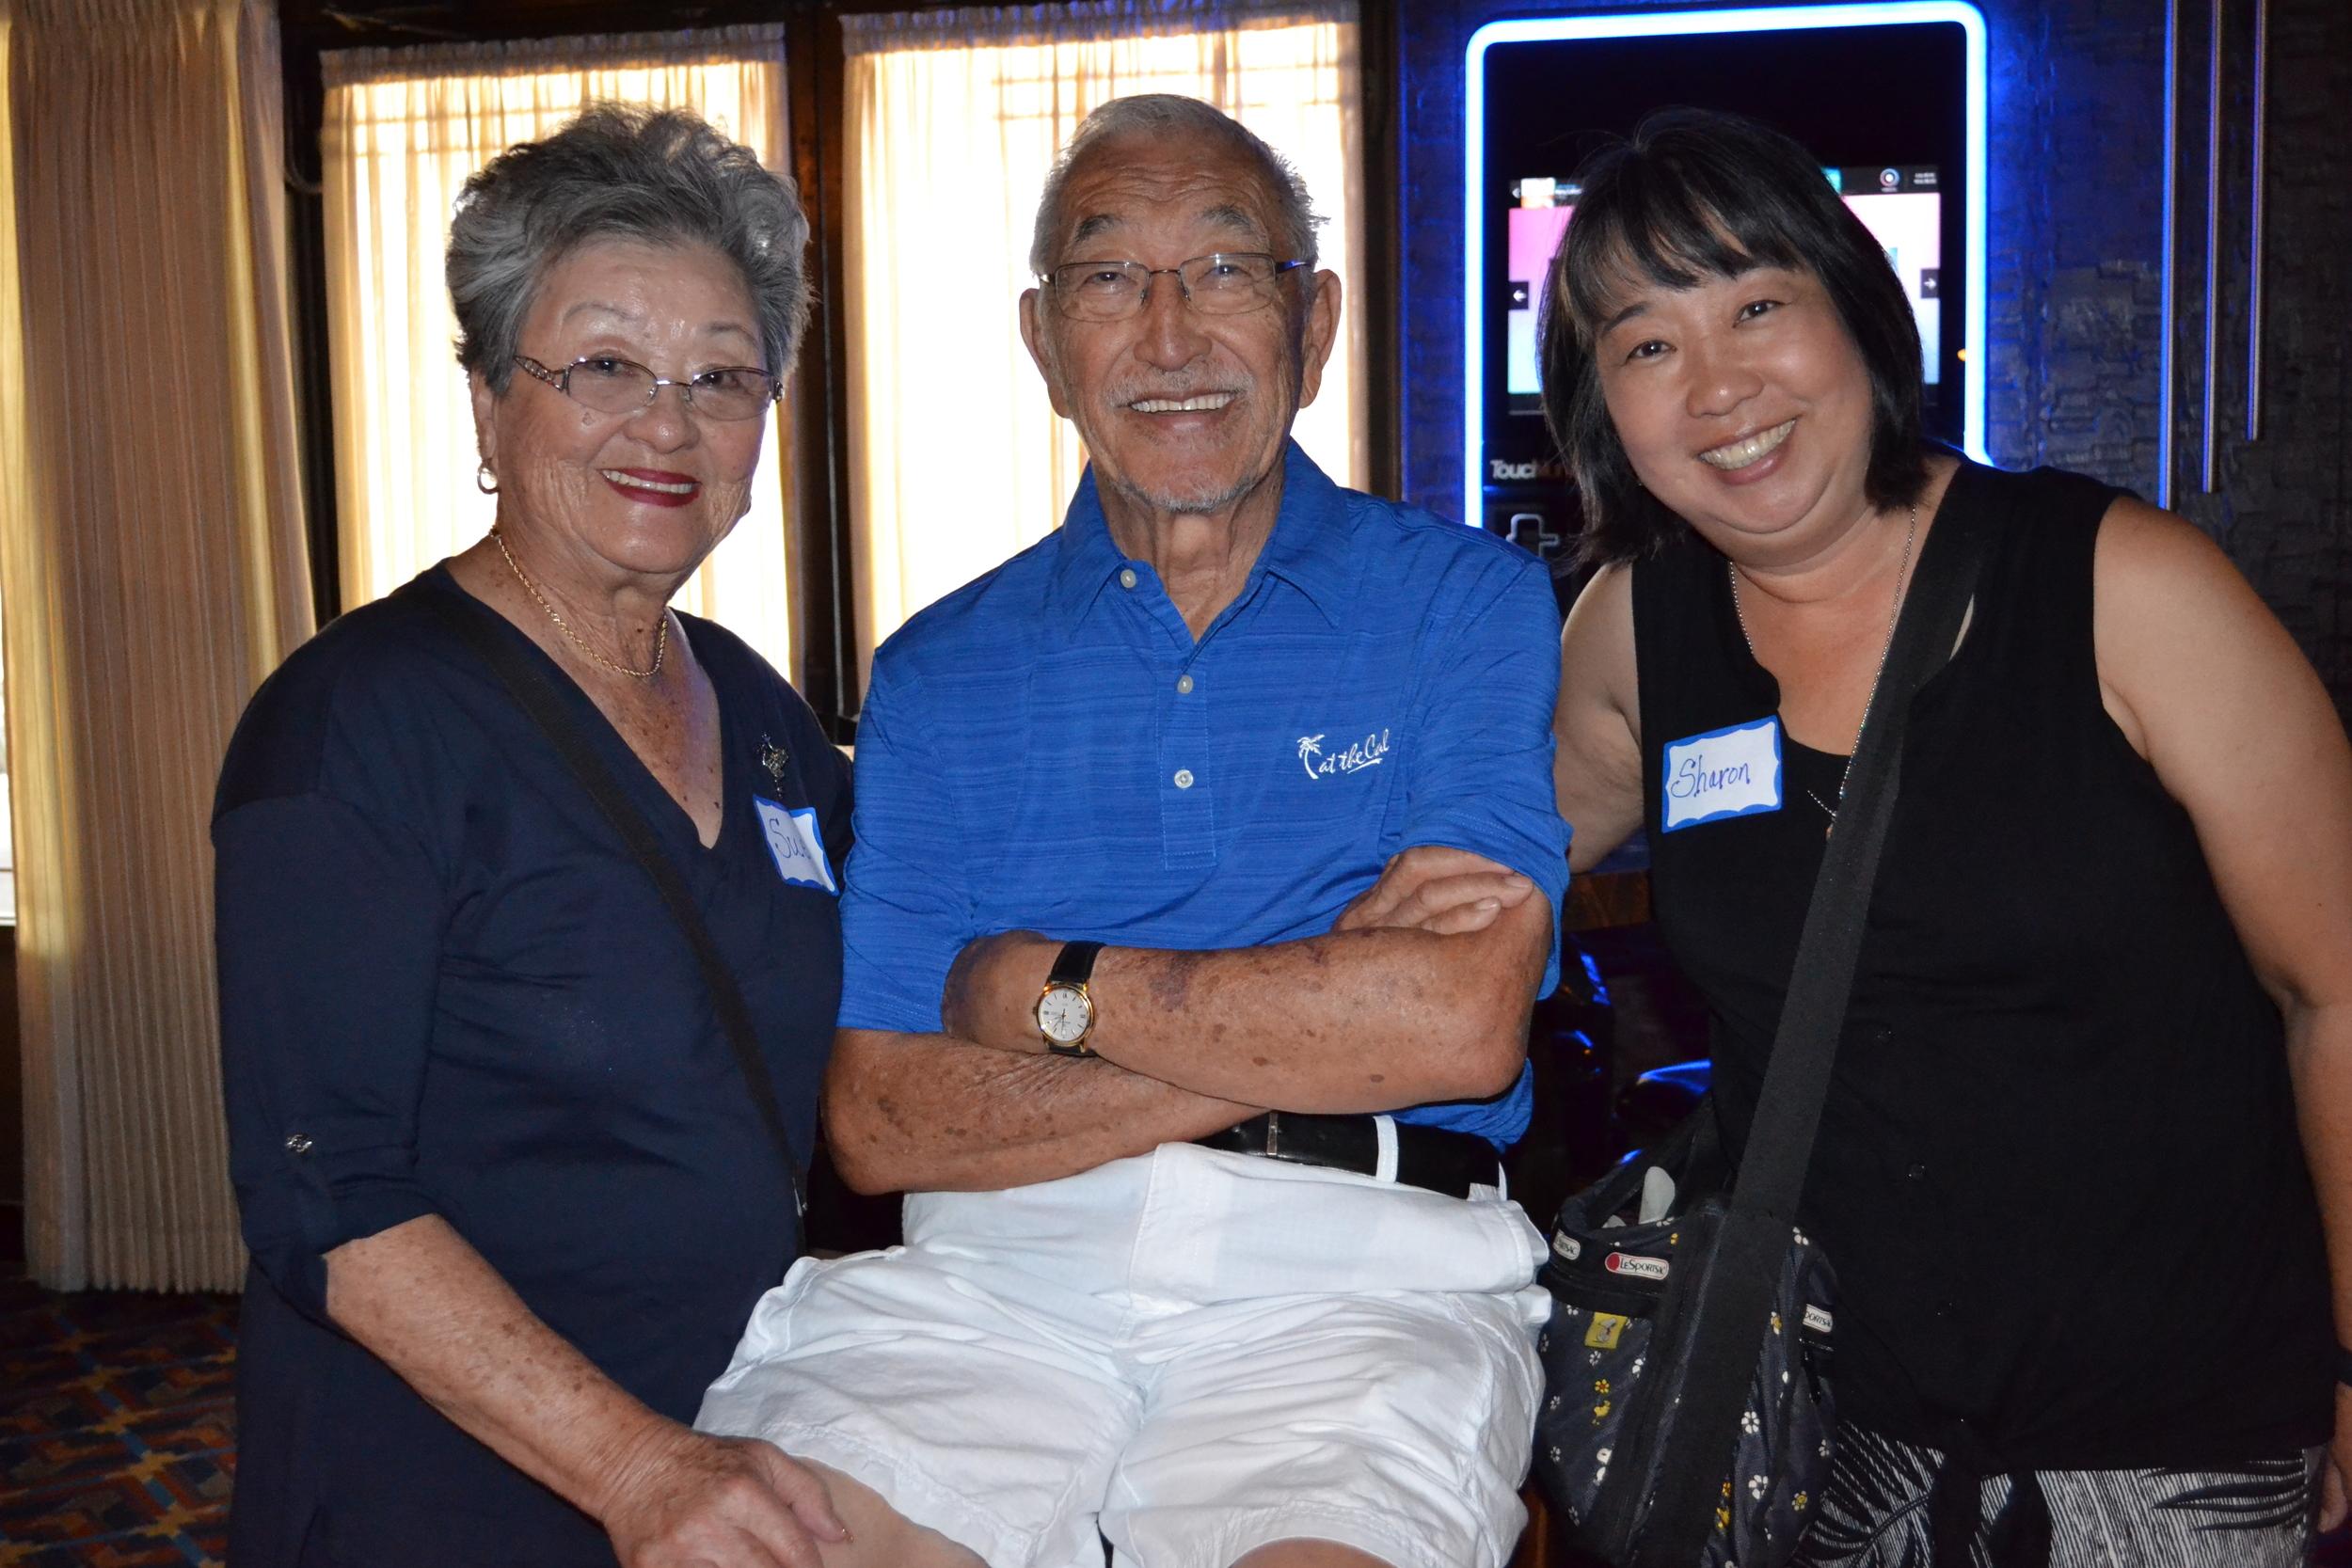 At the reunion: Sue and Ed Hanki; Sharon Hanki